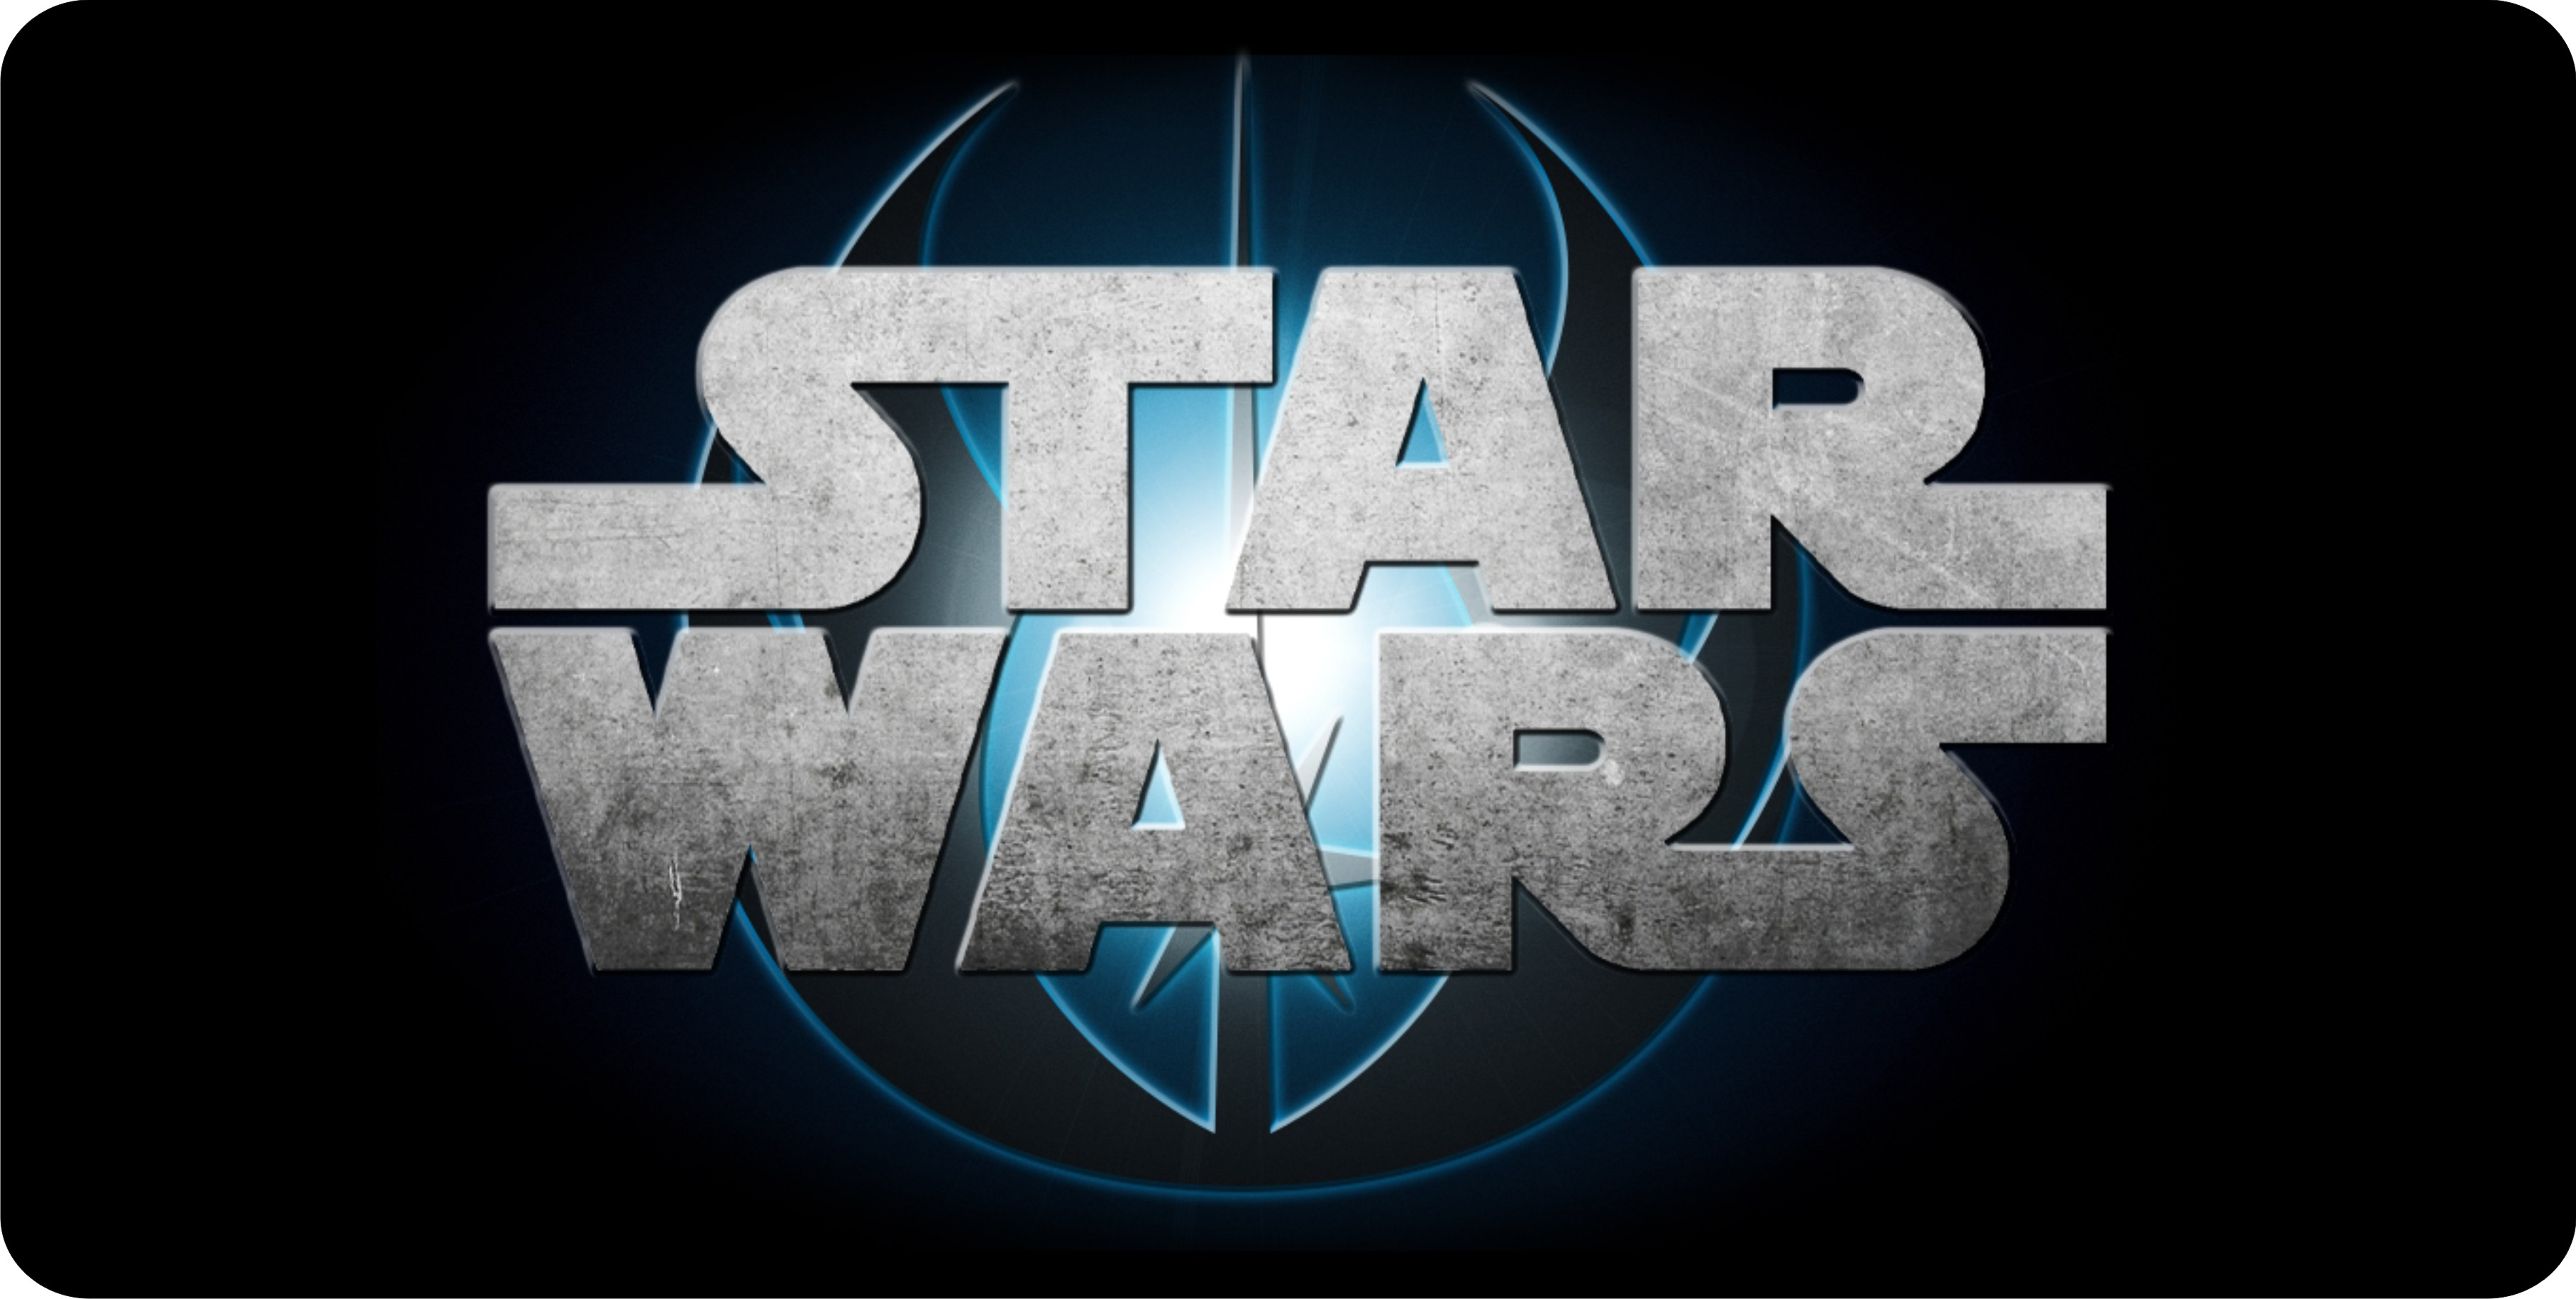 star wars logo - 973×673